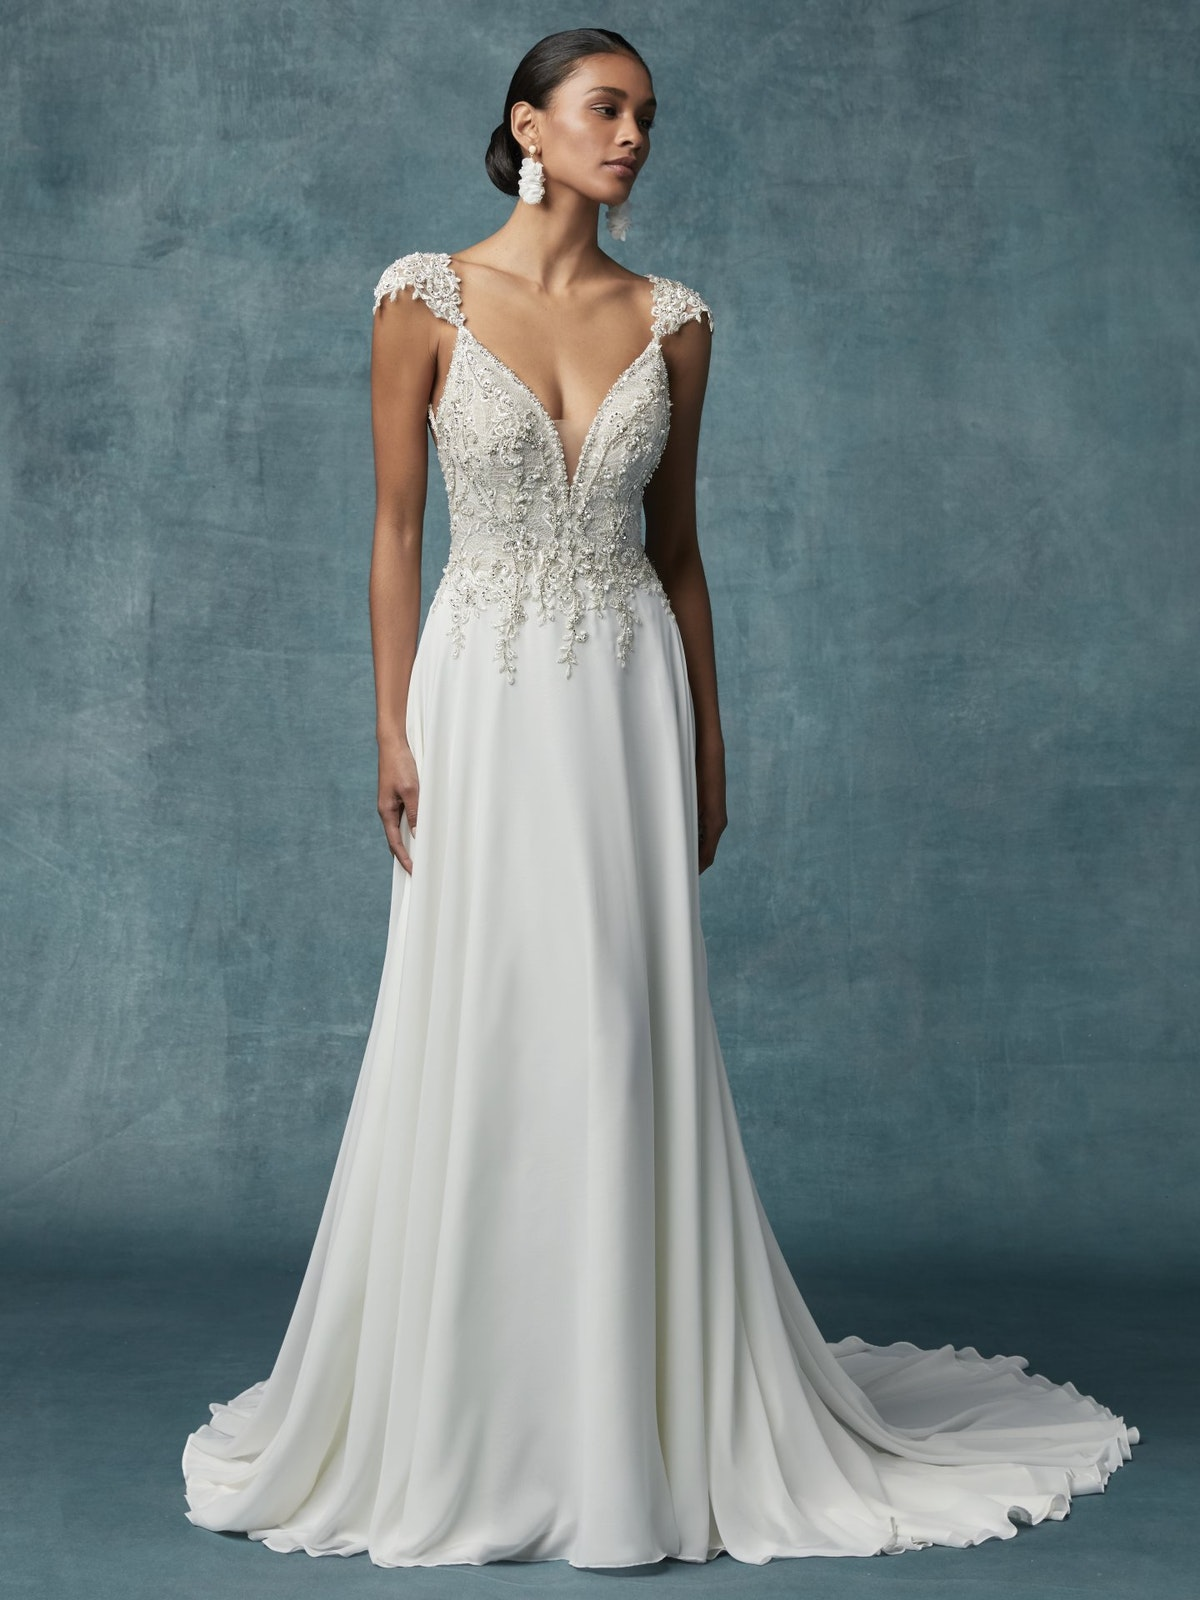 Gabor A Line Chiffon Wedding Dress   Maggie Sottero